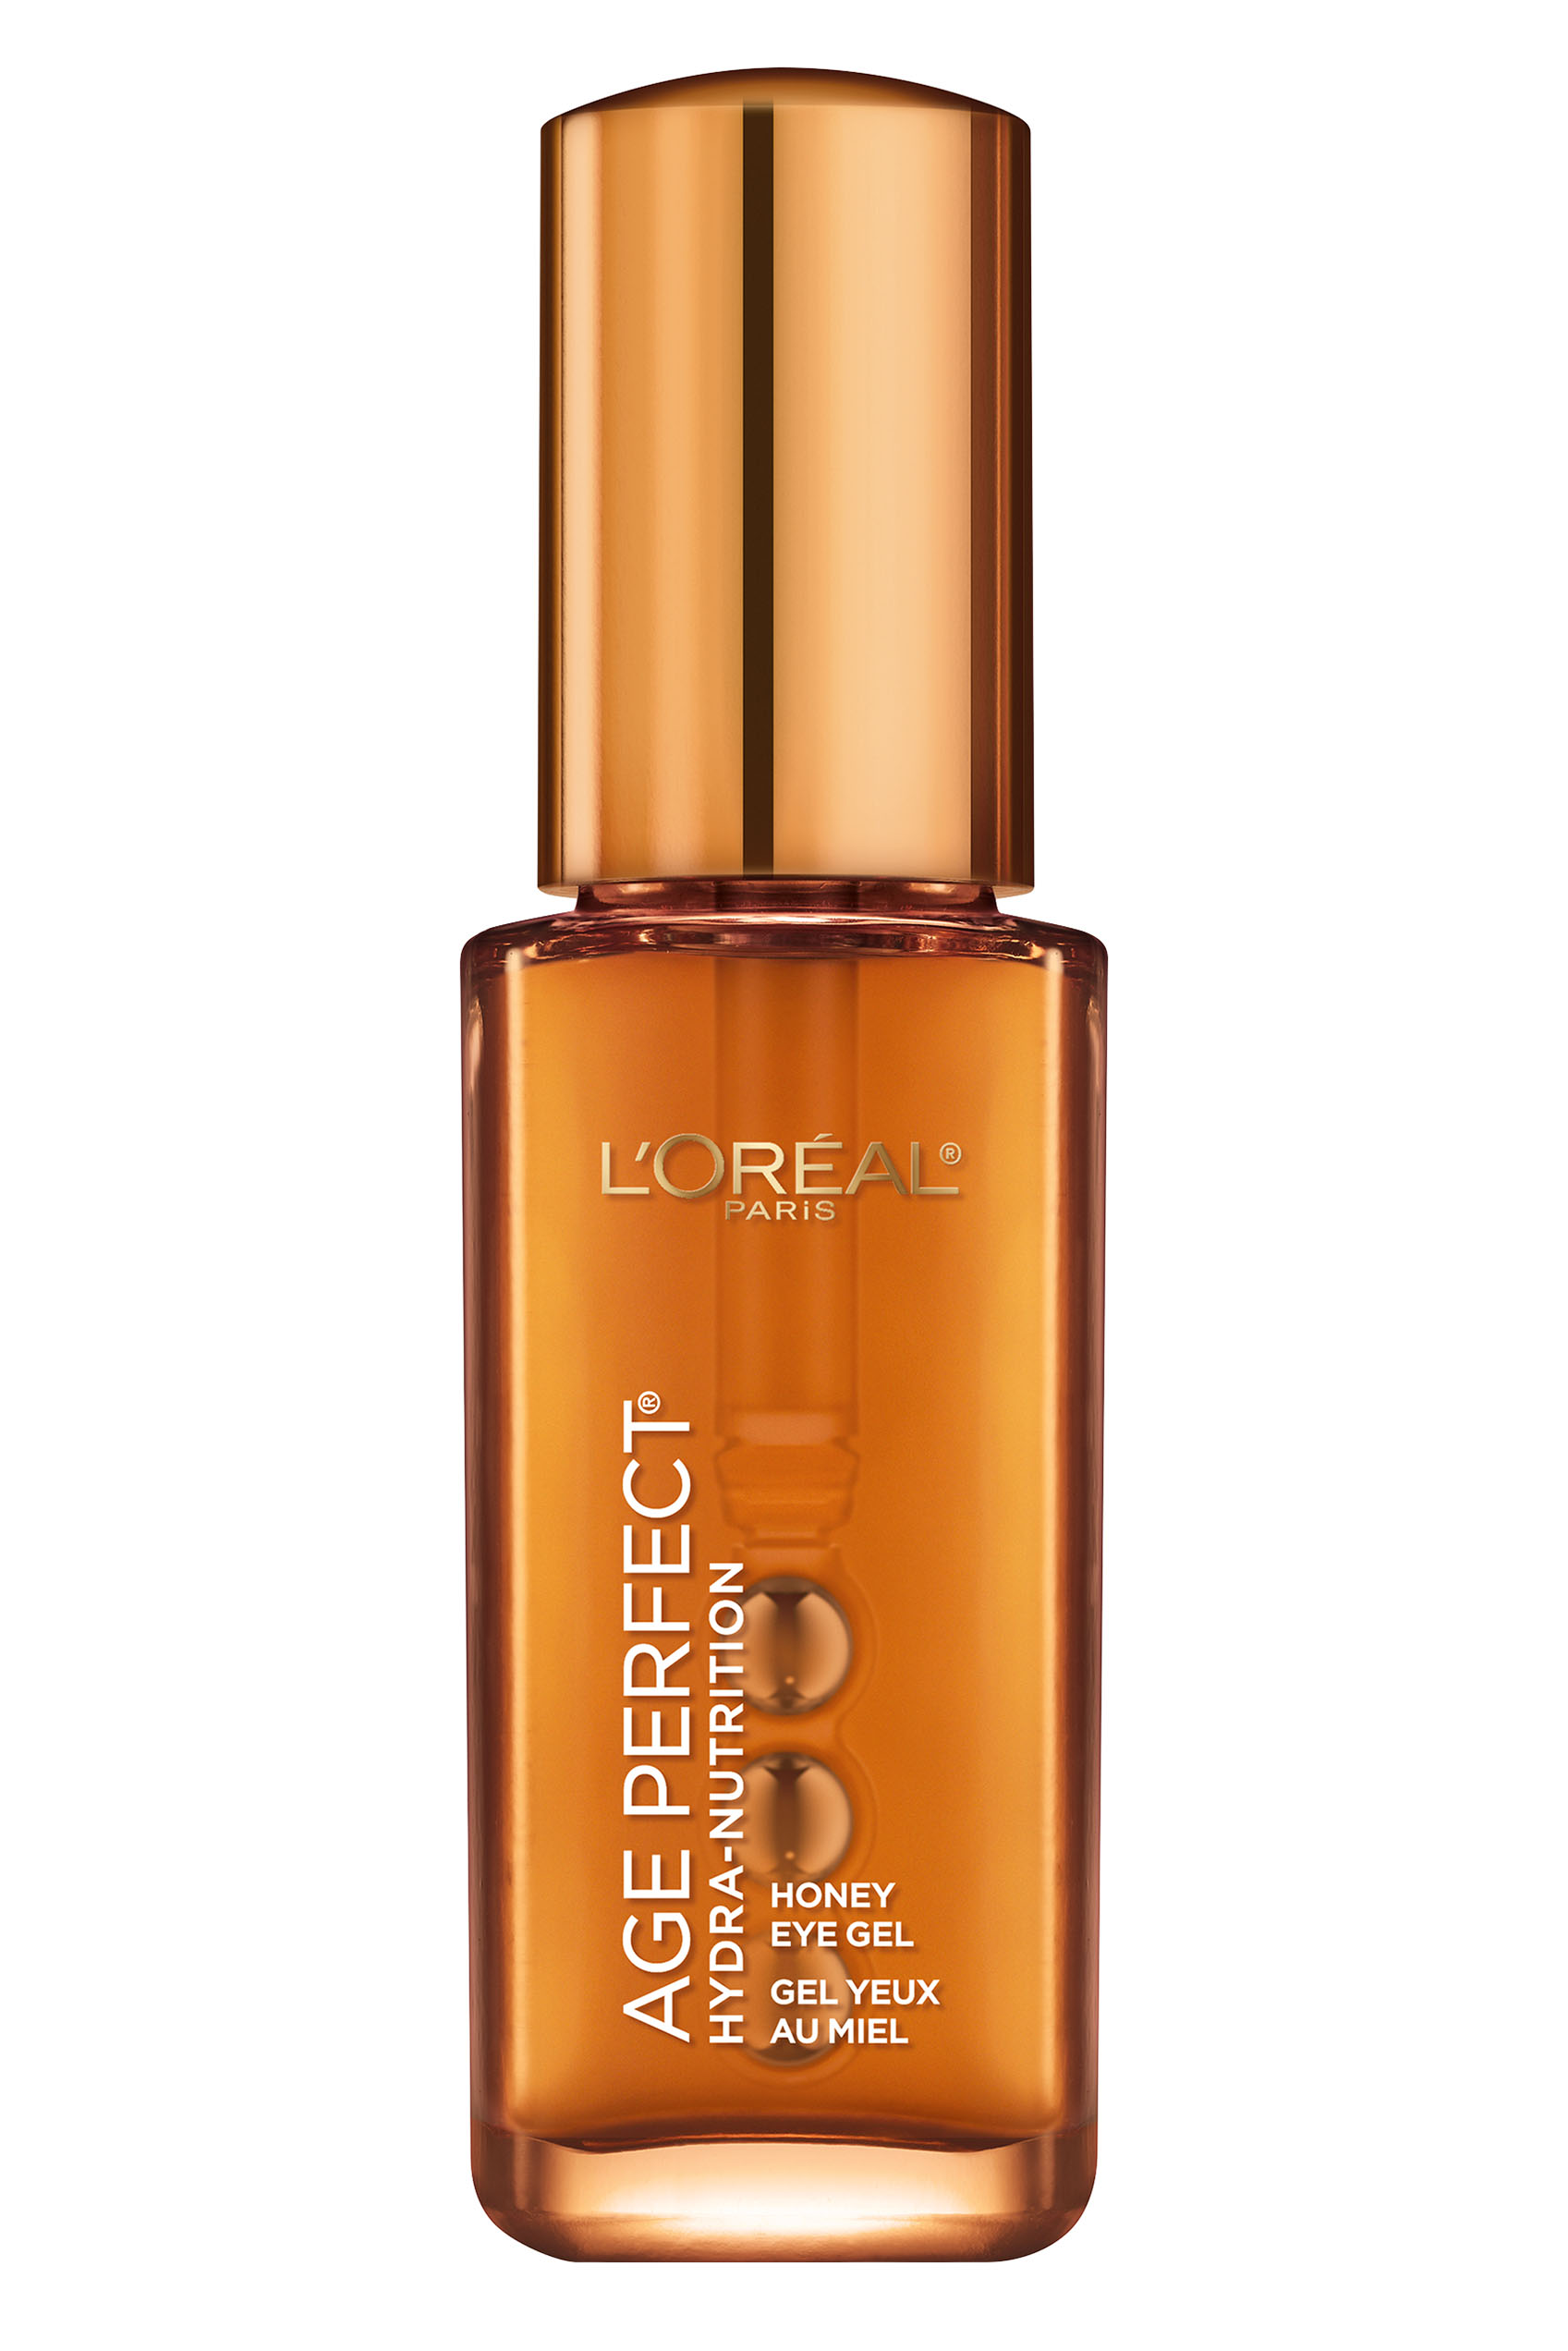 L'Oréal Paris Age Perfect Hydra-Nutrition Honey Eye Gel